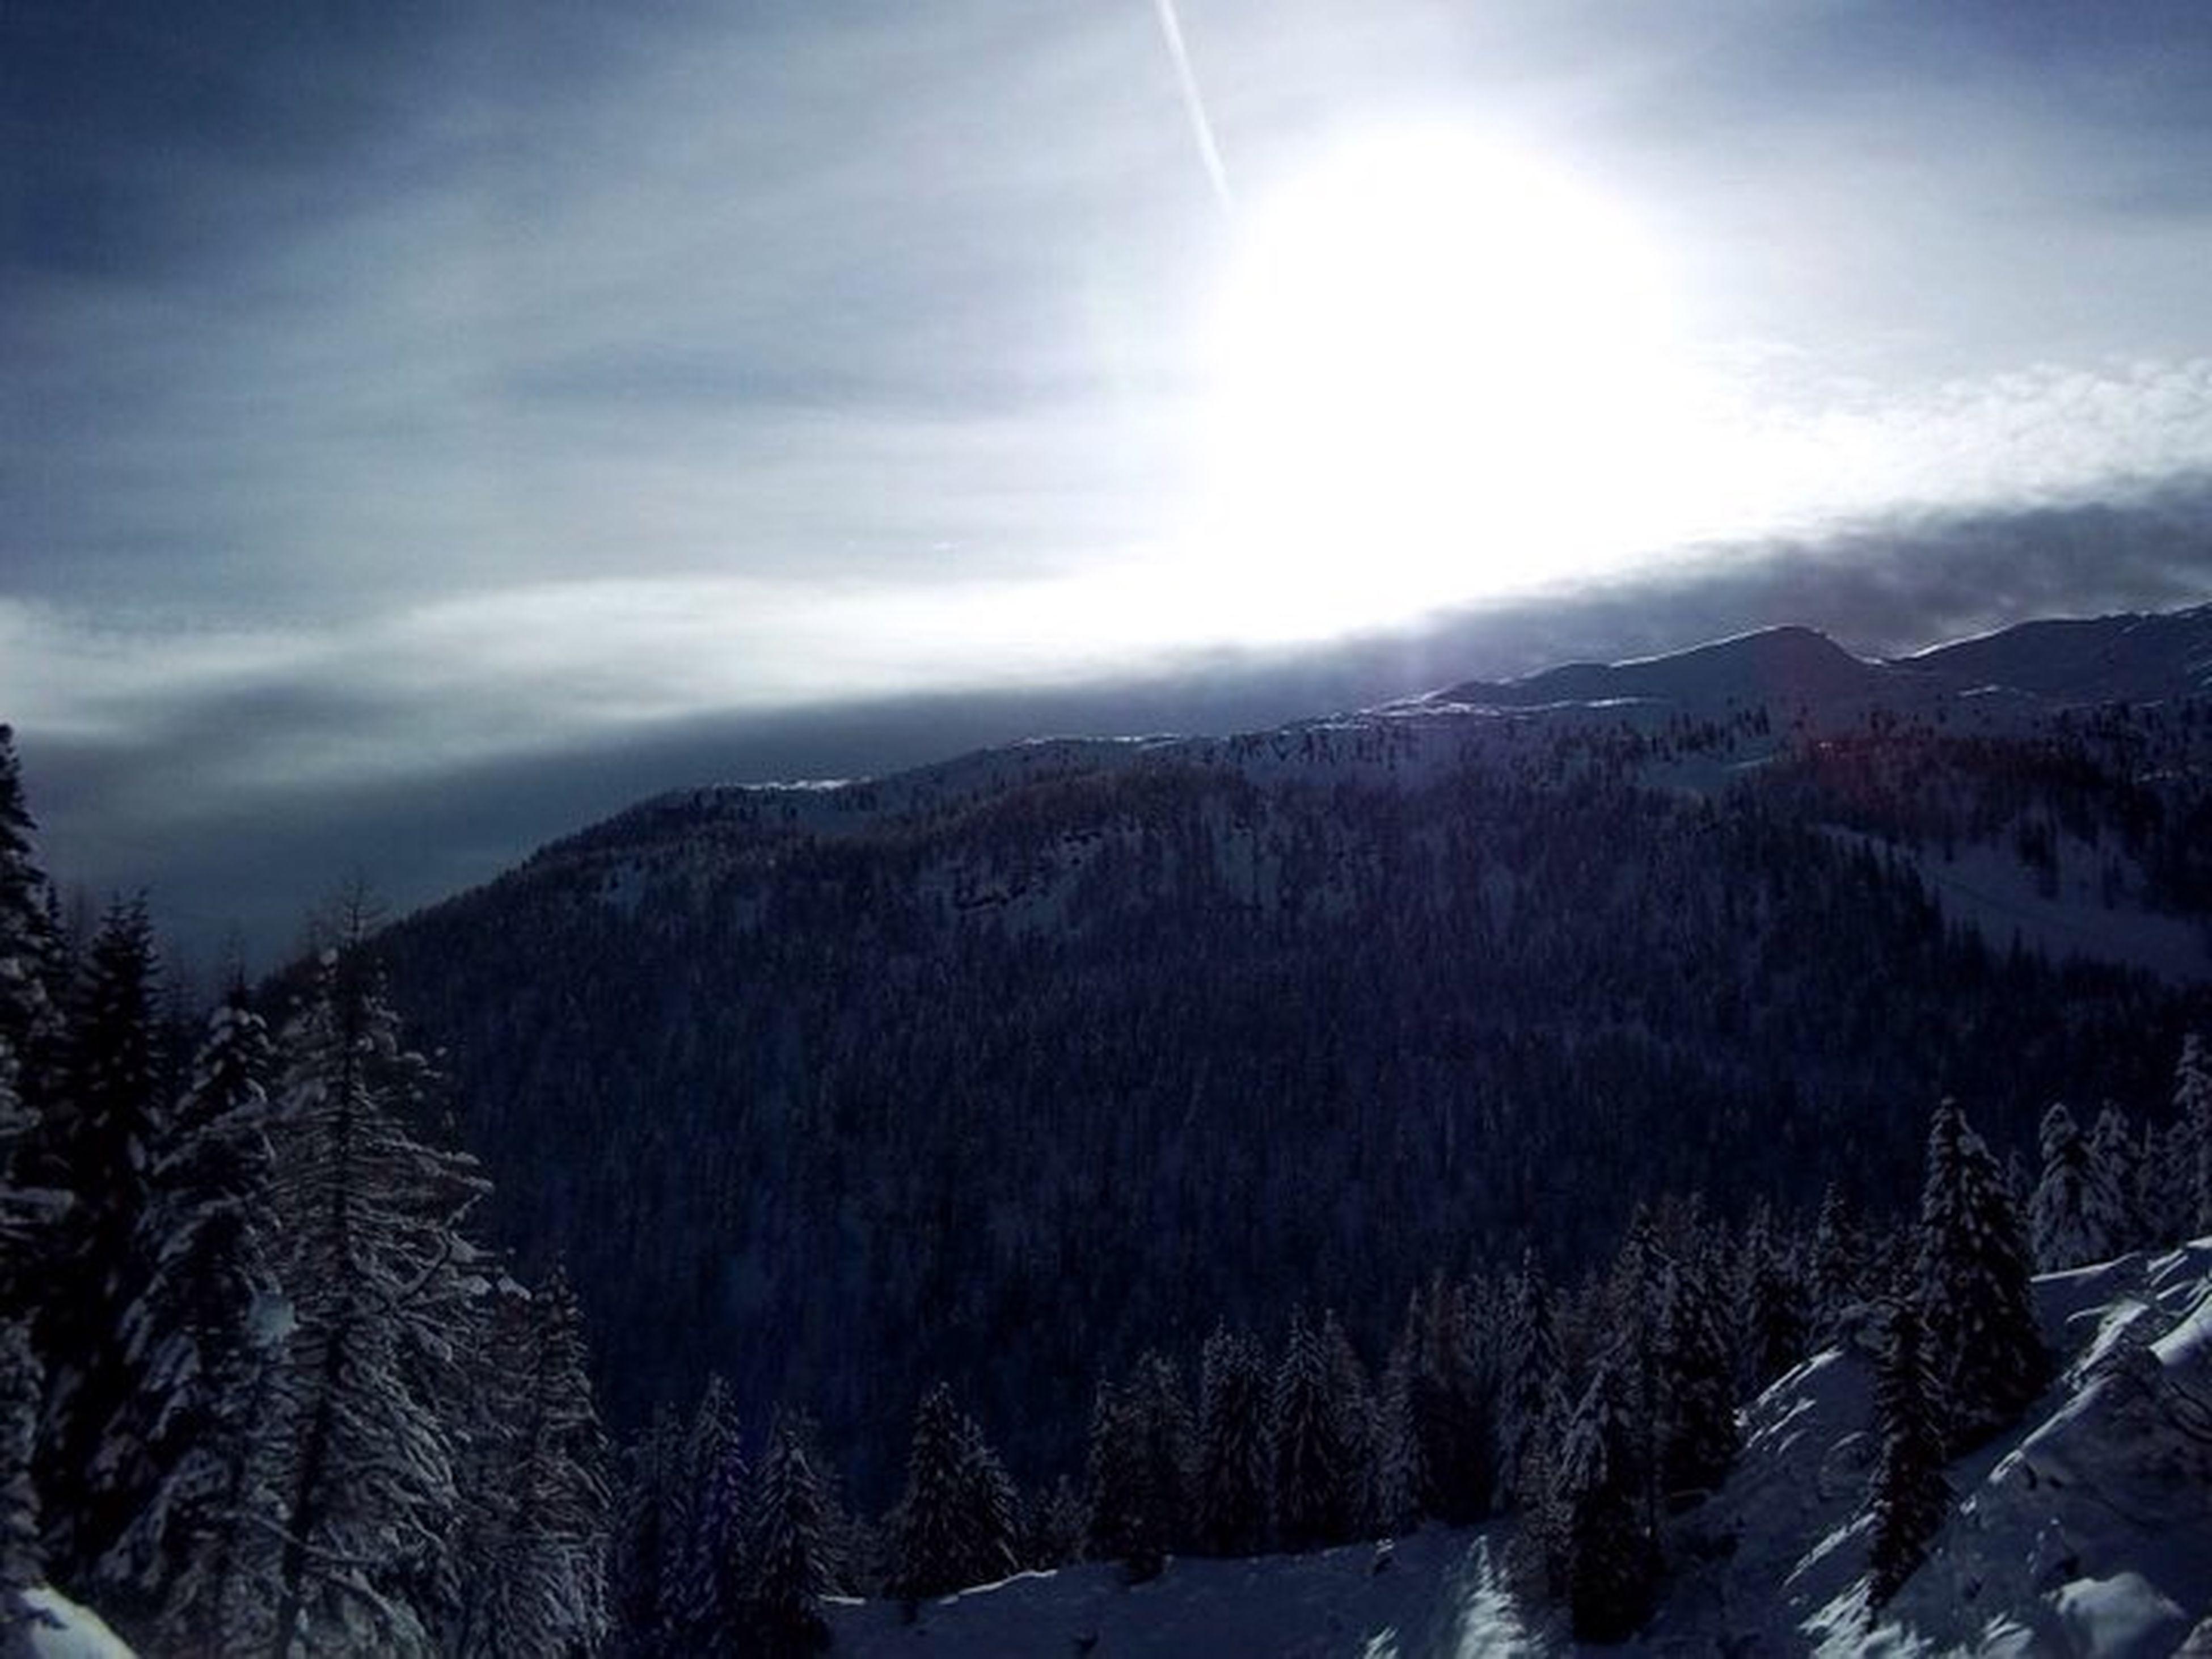 snow, mountain, winter, cold temperature, tranquil scene, tranquility, scenics, beauty in nature, mountain range, sky, season, sun, landscape, nature, sunlight, tree, snowcapped mountain, weather, sunbeam, cloud - sky